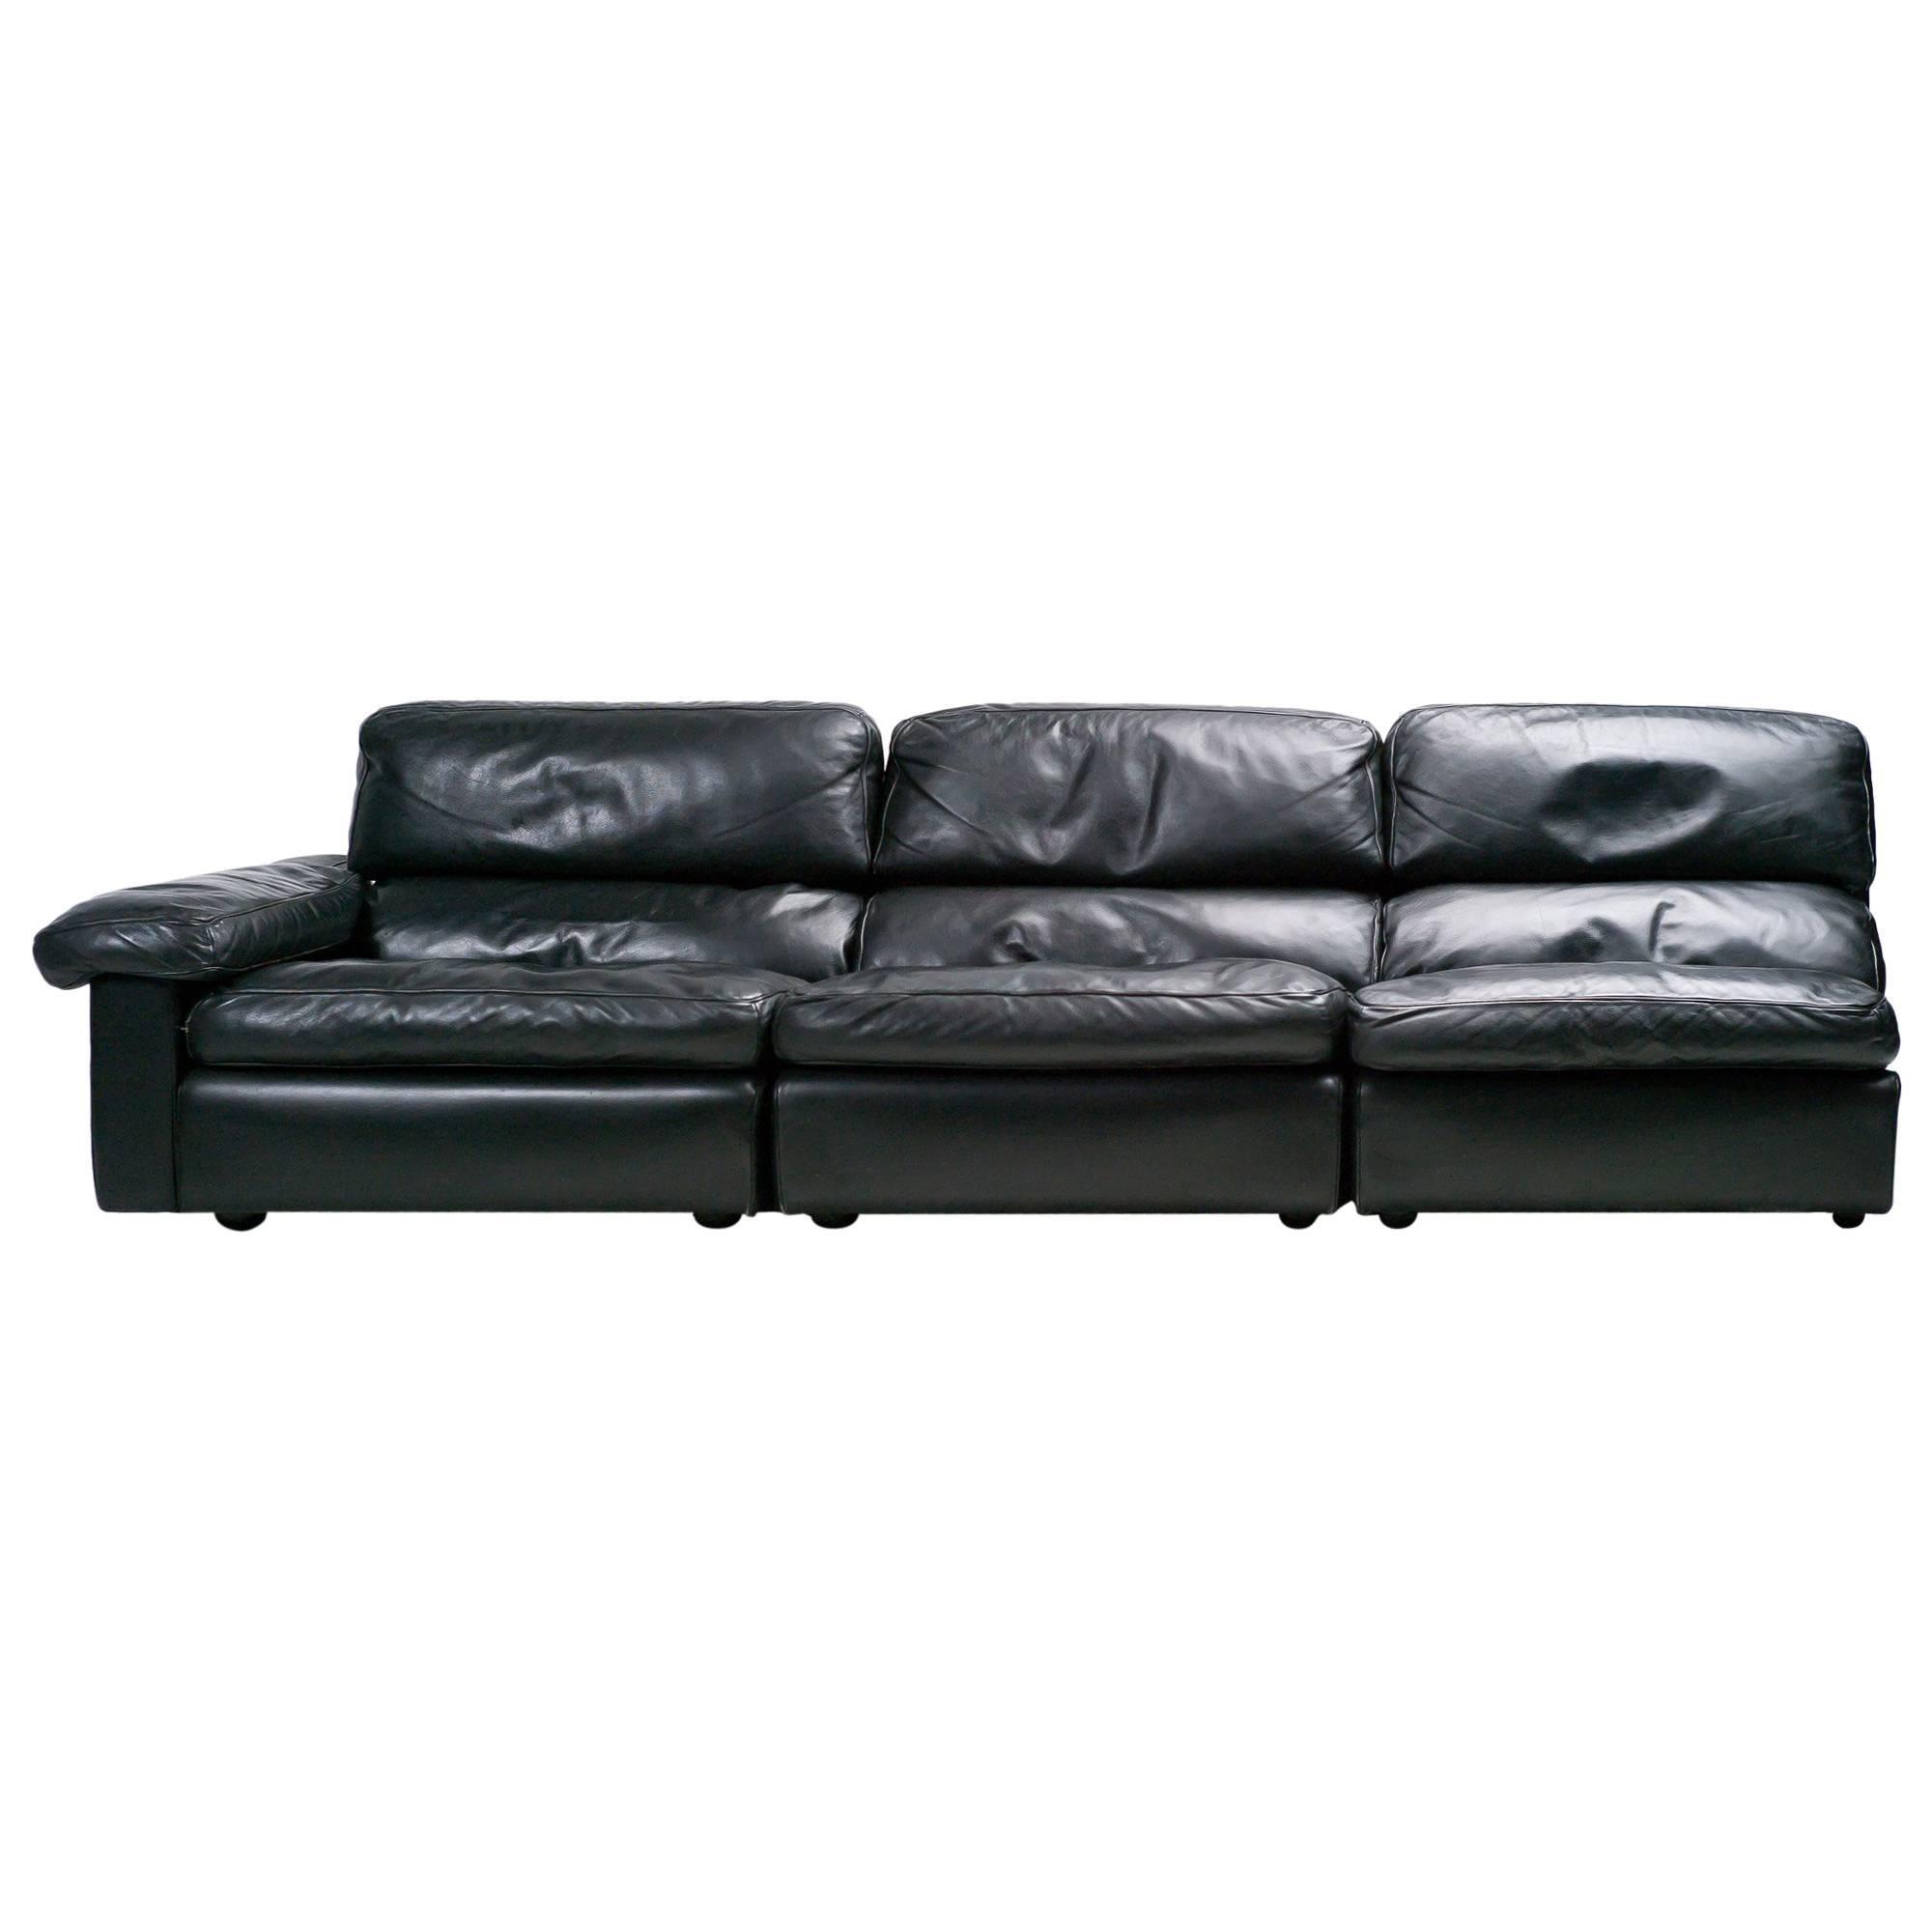 Poltrona Frau Petronio Sectional Sofa By Agnoli For Sale